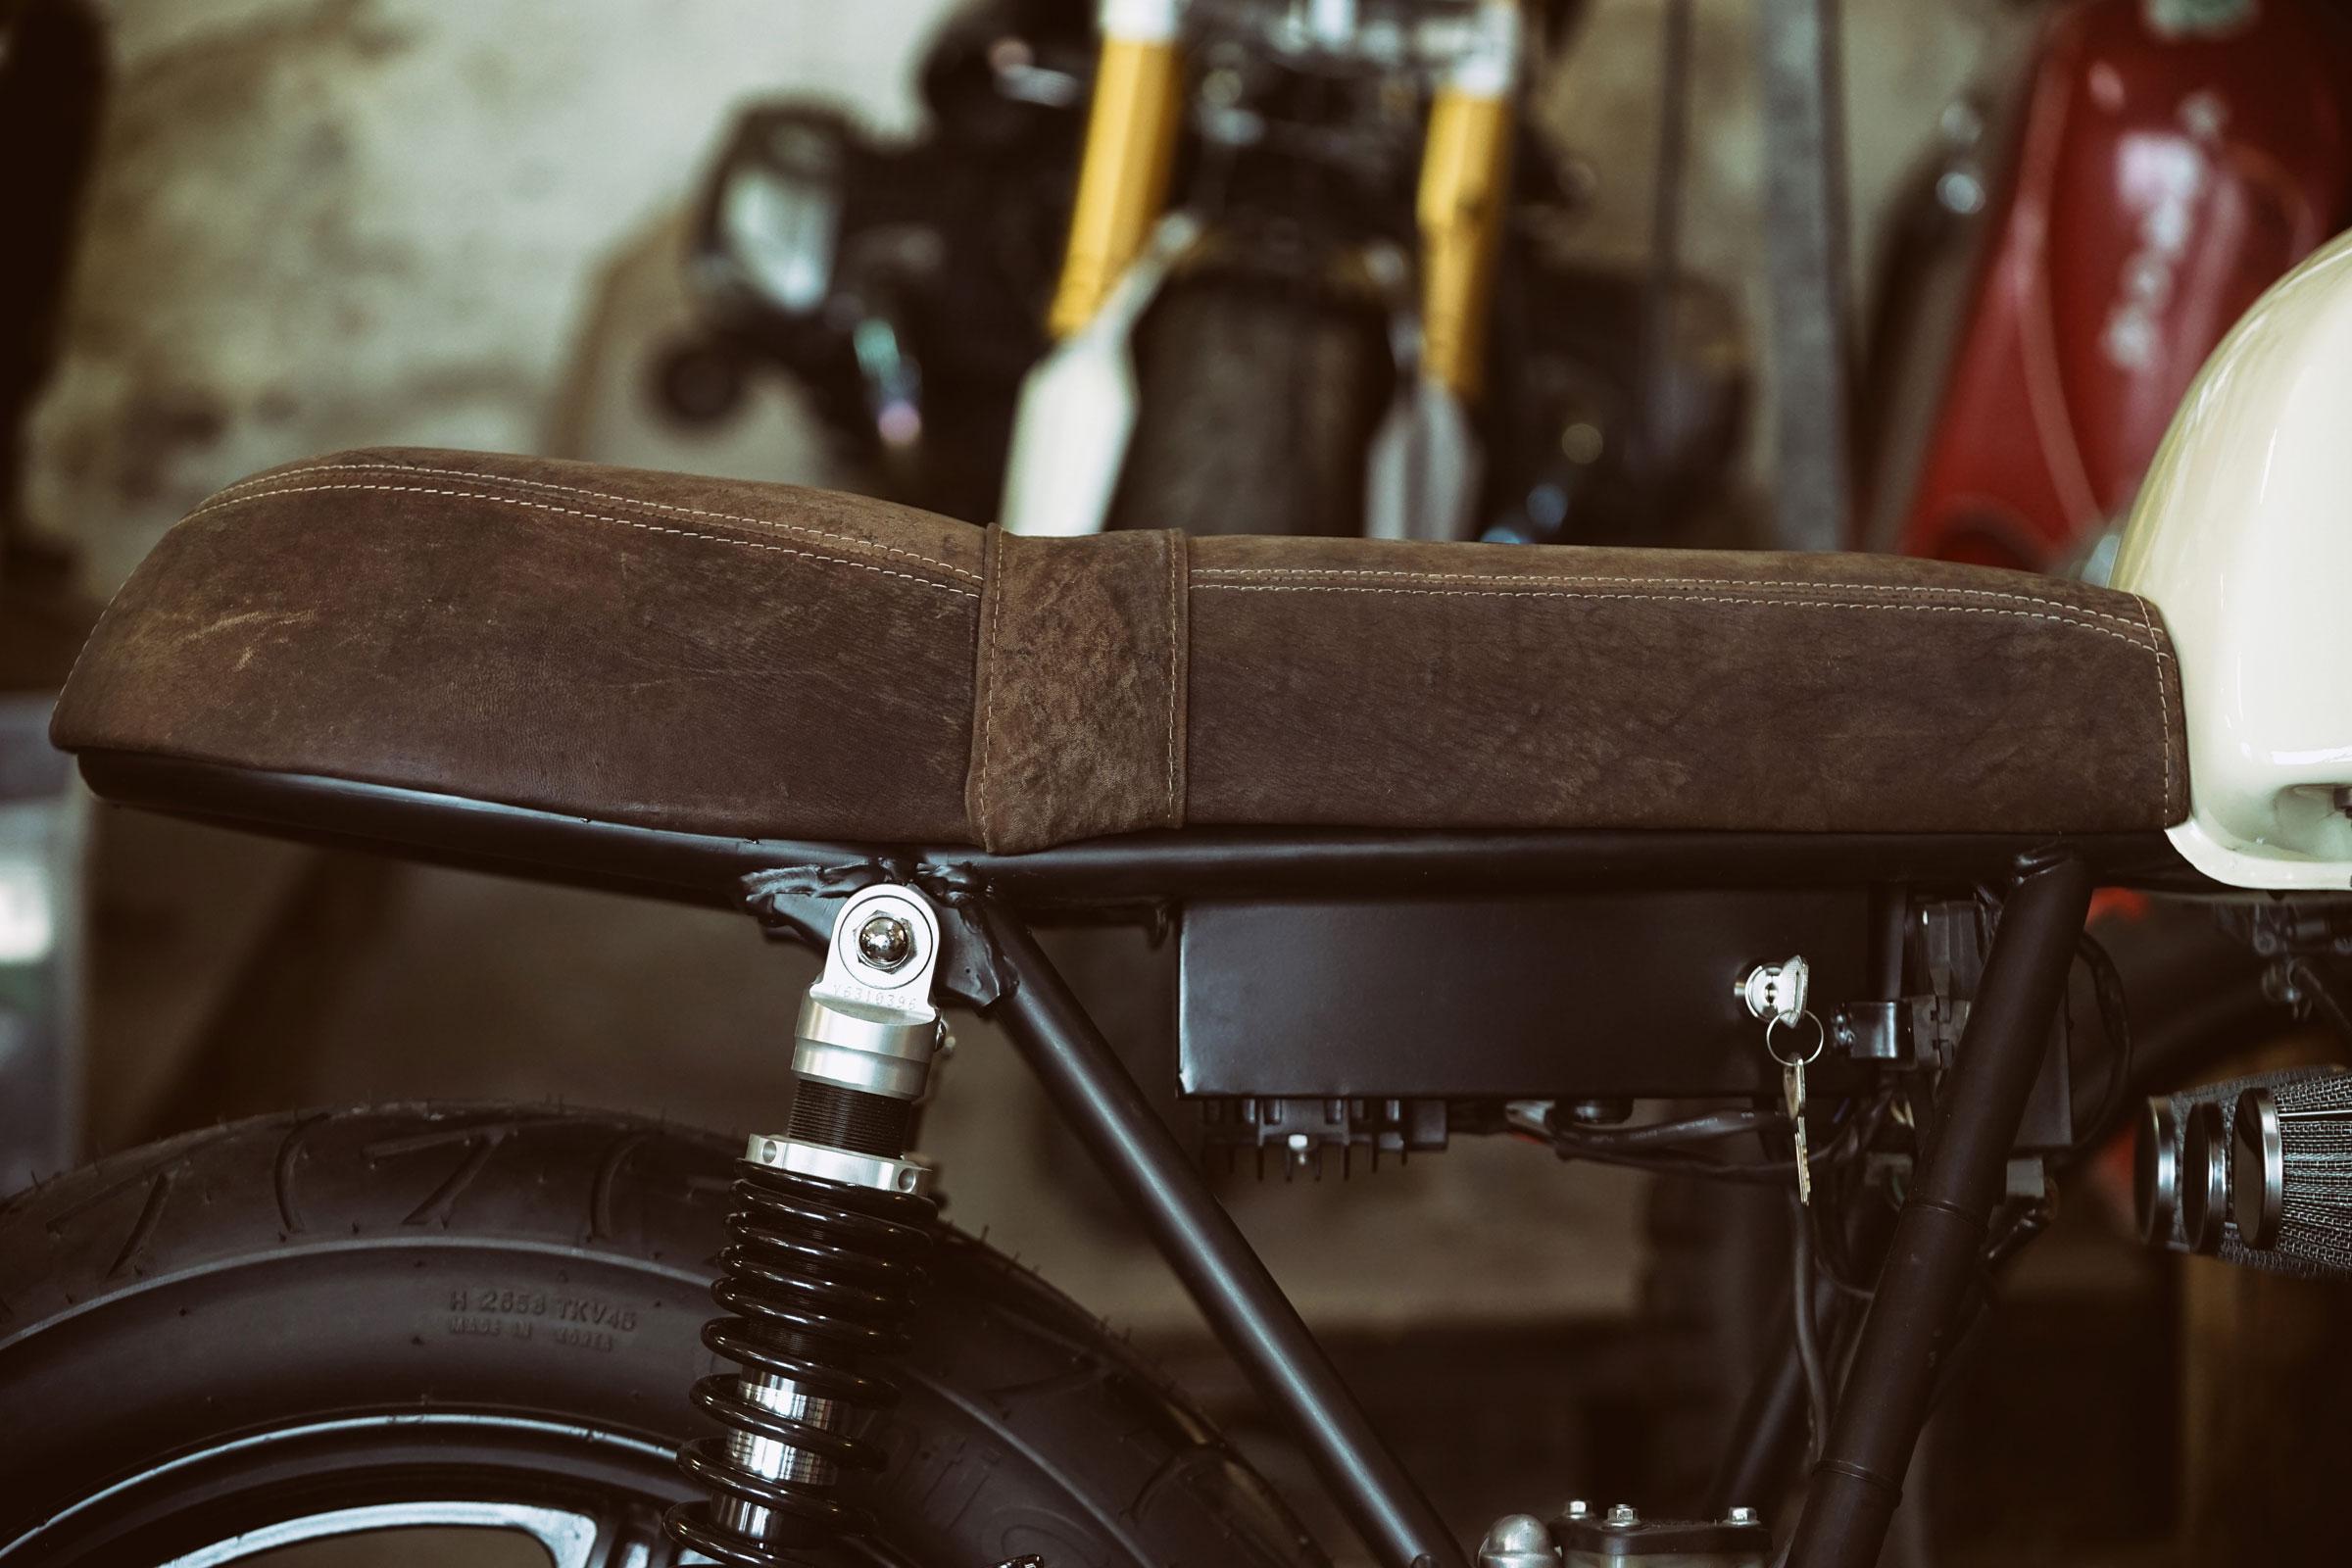 TITAN-Heavy-Metal_Honda-Yamaha-Umbau-XS-850_Cafe-Racer-Graz-Motorrad-Umbau-Austria-Vintage_Custom-Bikes-Sattel-Heck-Umbau (26)